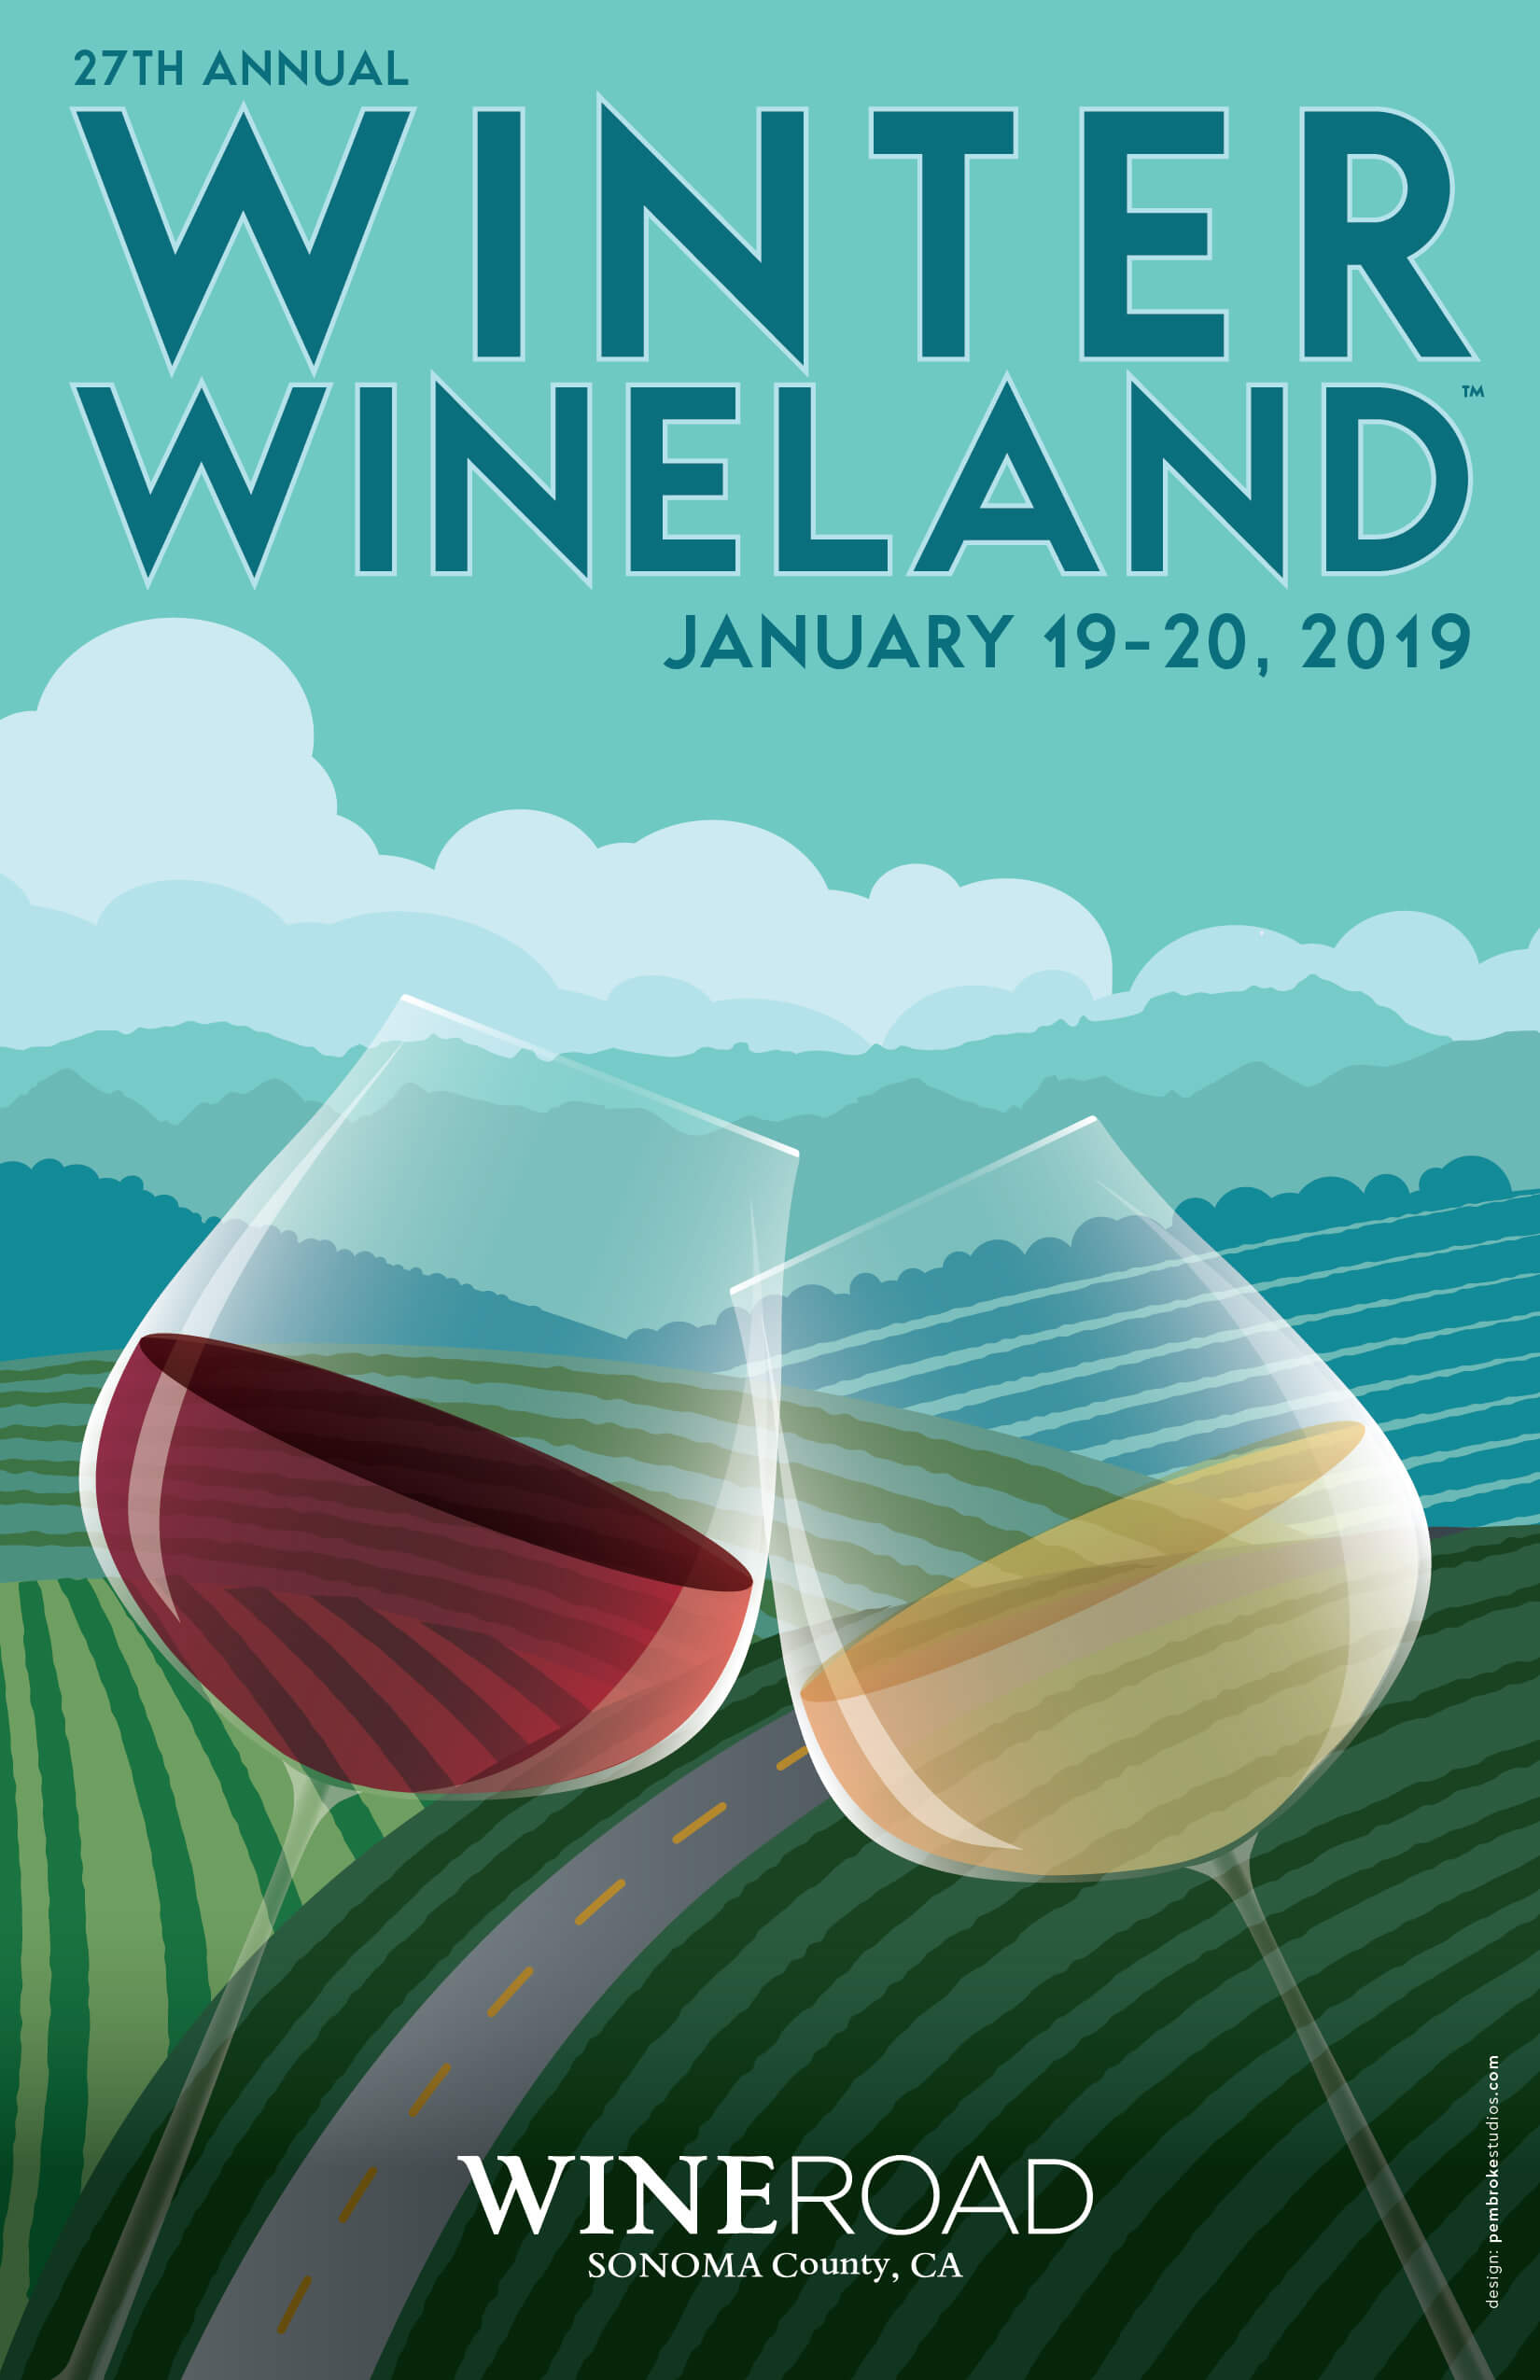 Wine Road's Winter WINEland 2019